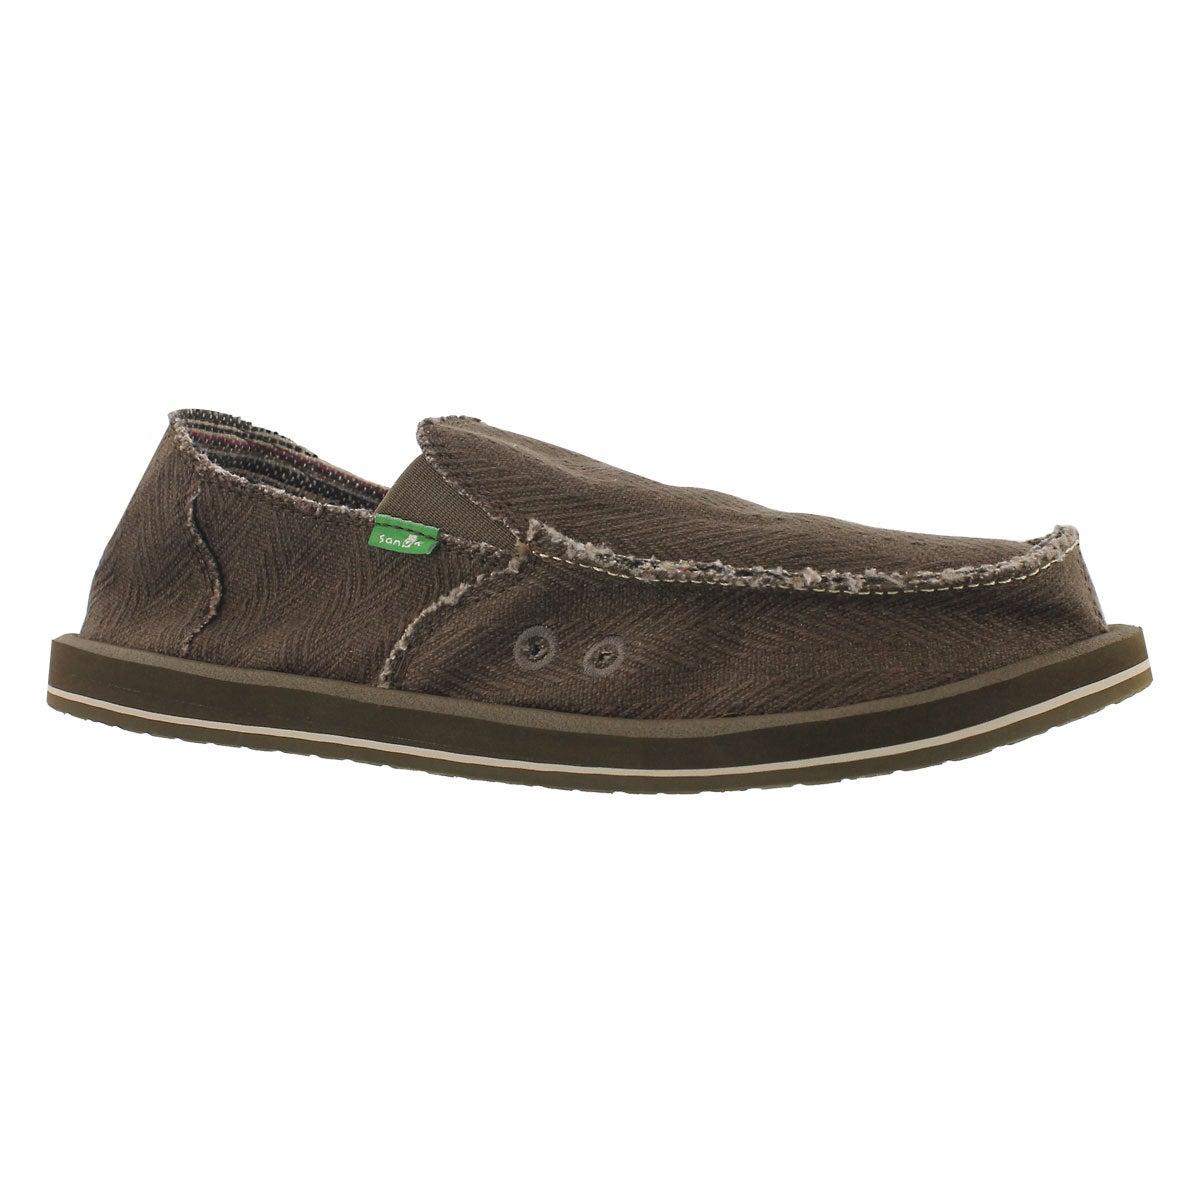 Men's HEMP olive slip on shoes